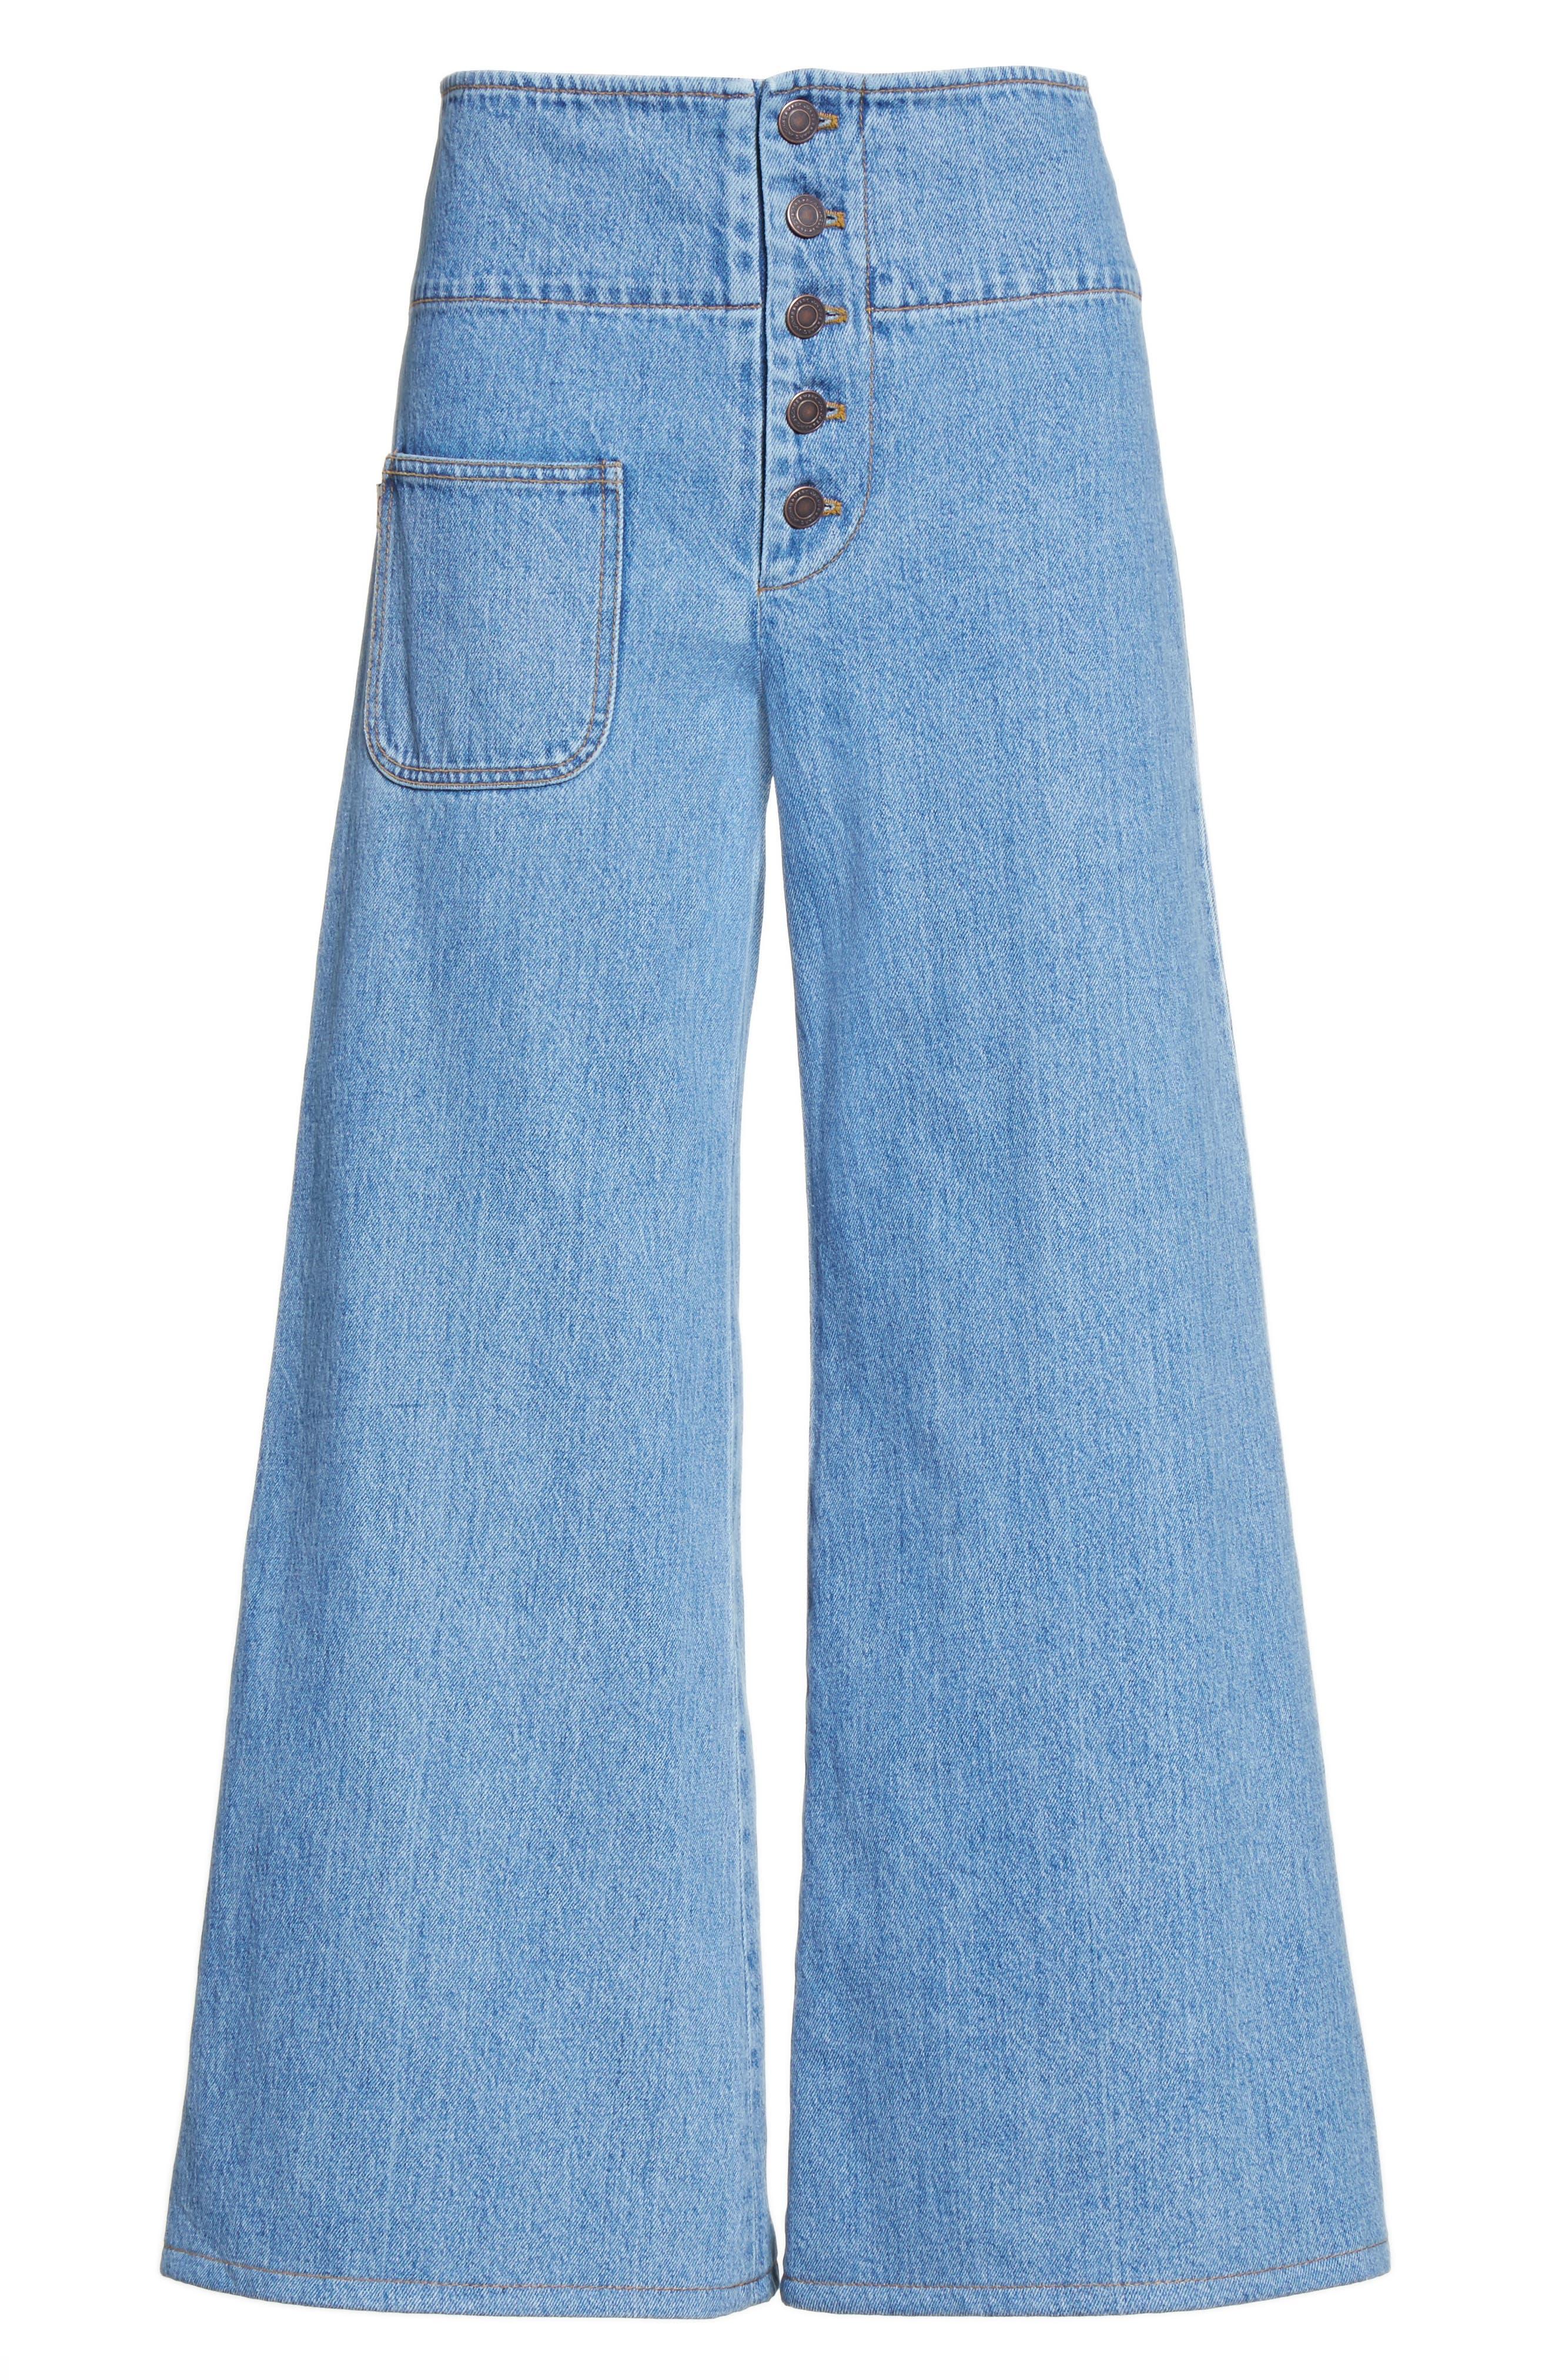 High Waist Crop Flare Jeans,                             Alternate thumbnail 4, color,                             Retro Indigo